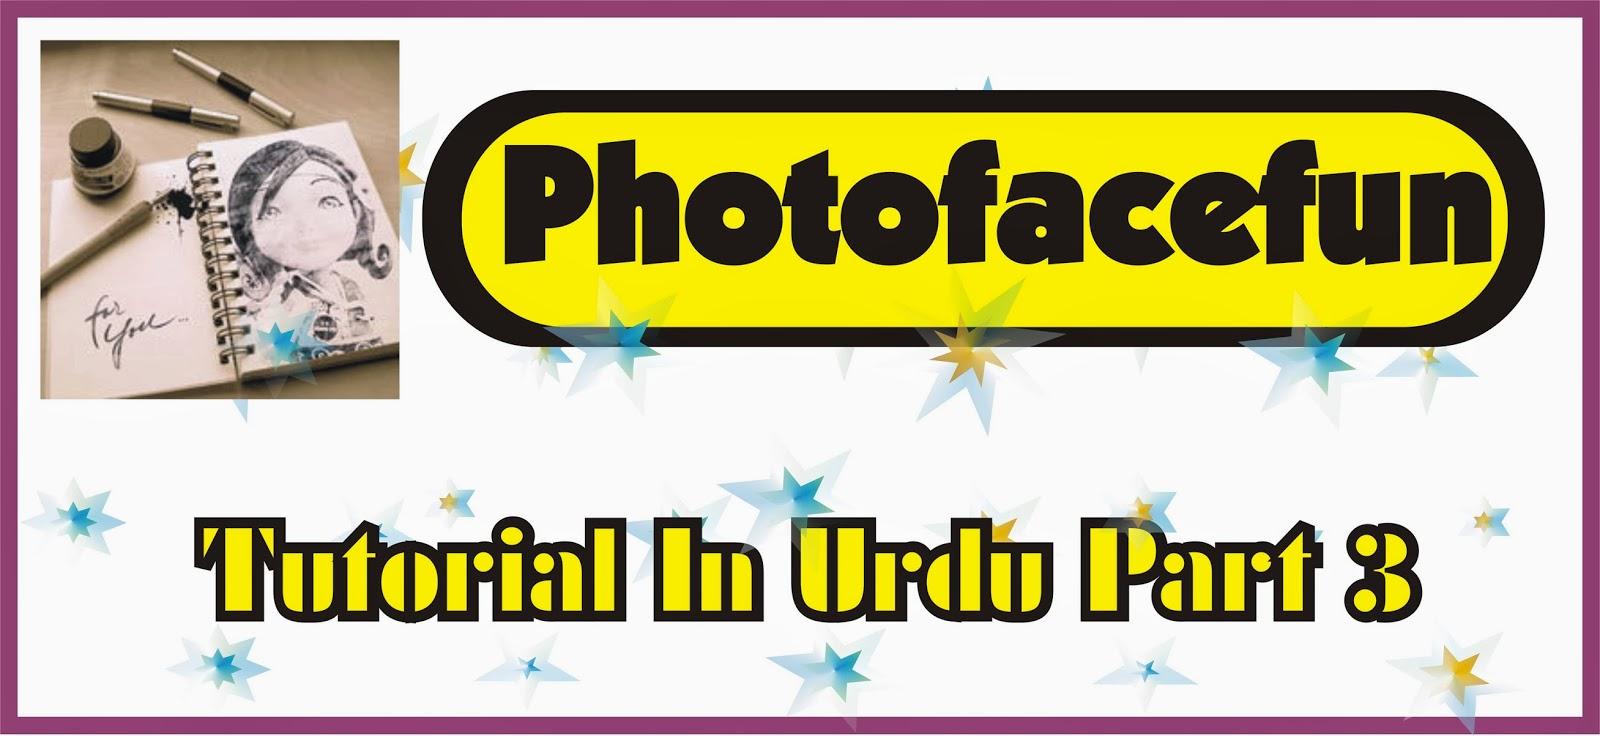 photofacefun photo frames section | framexwall com